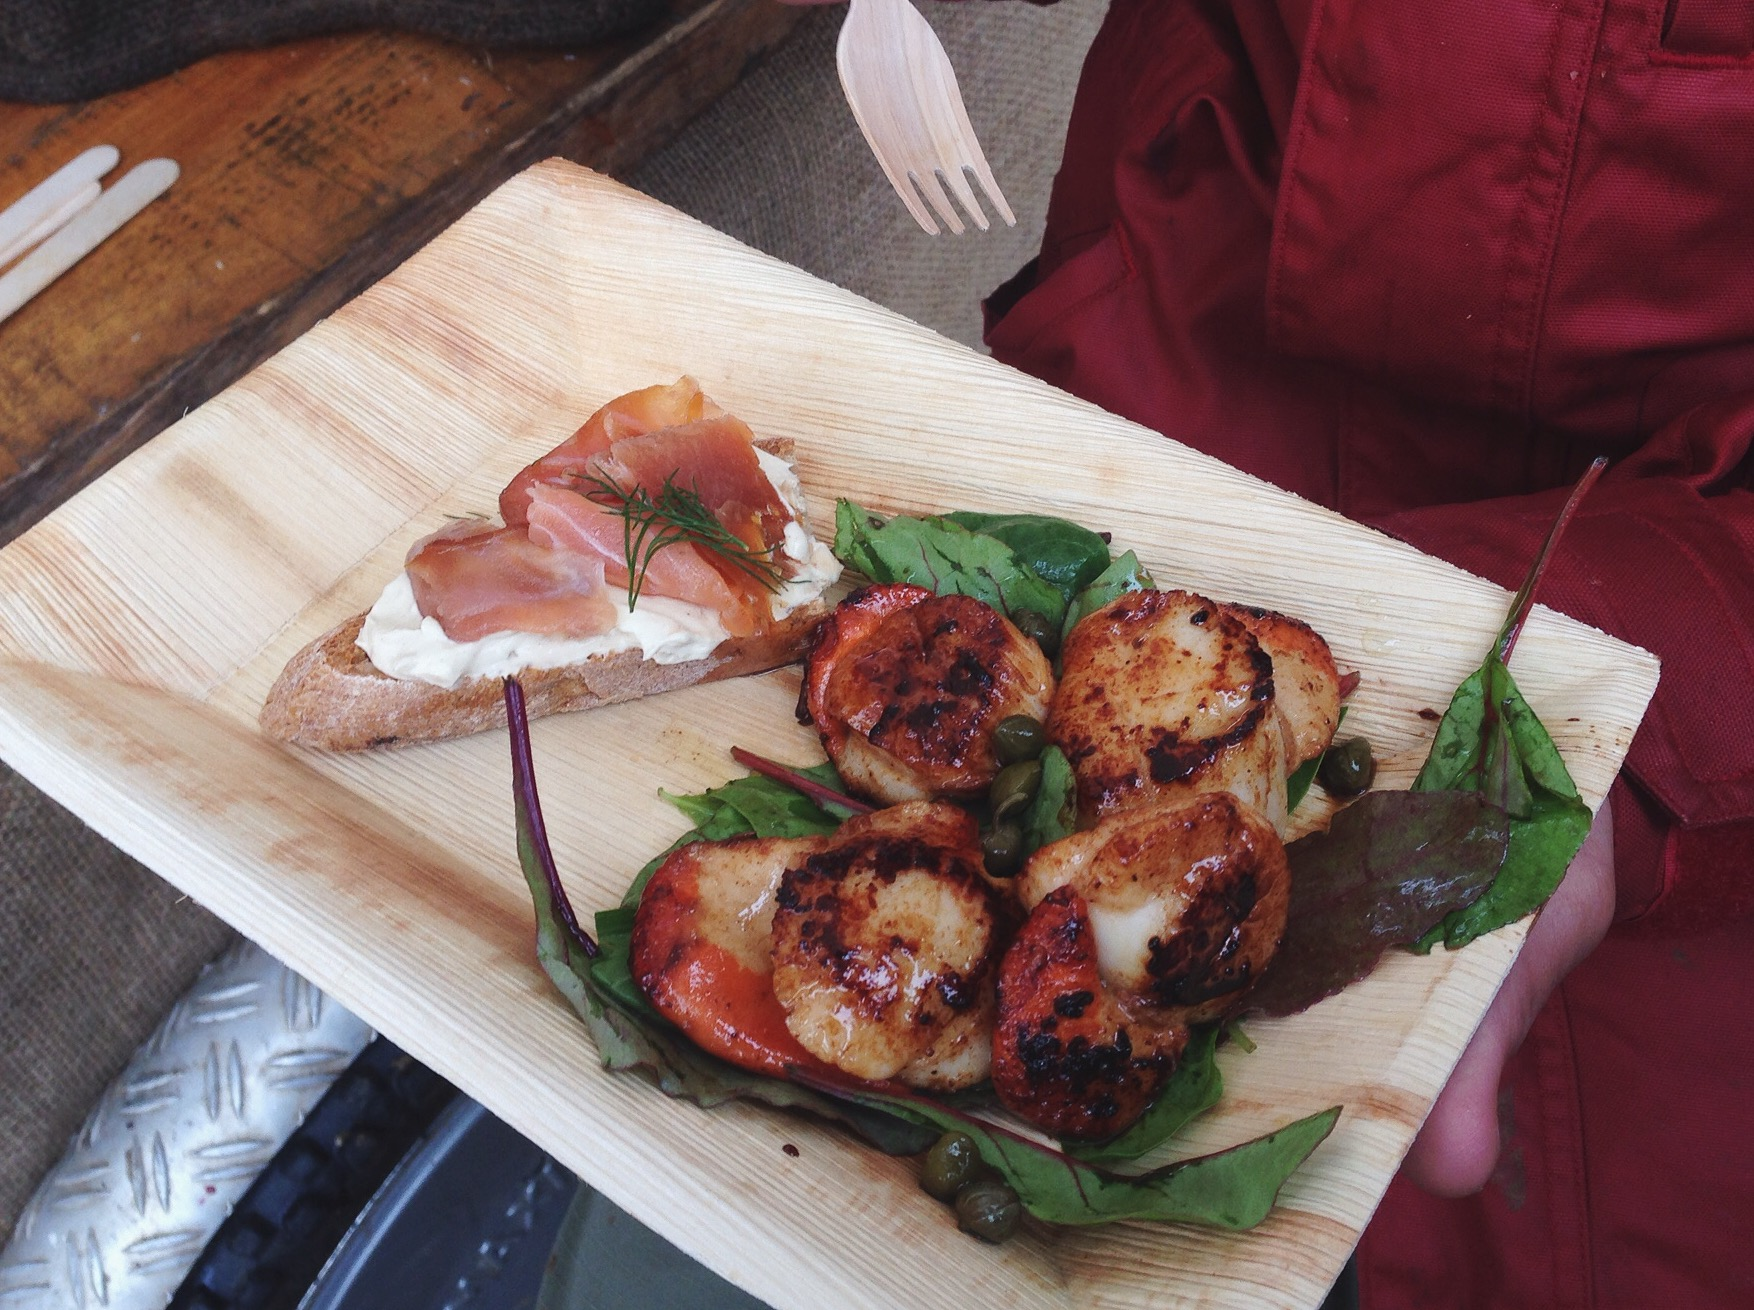 Pan-fried scallops & smoked salmon on toast